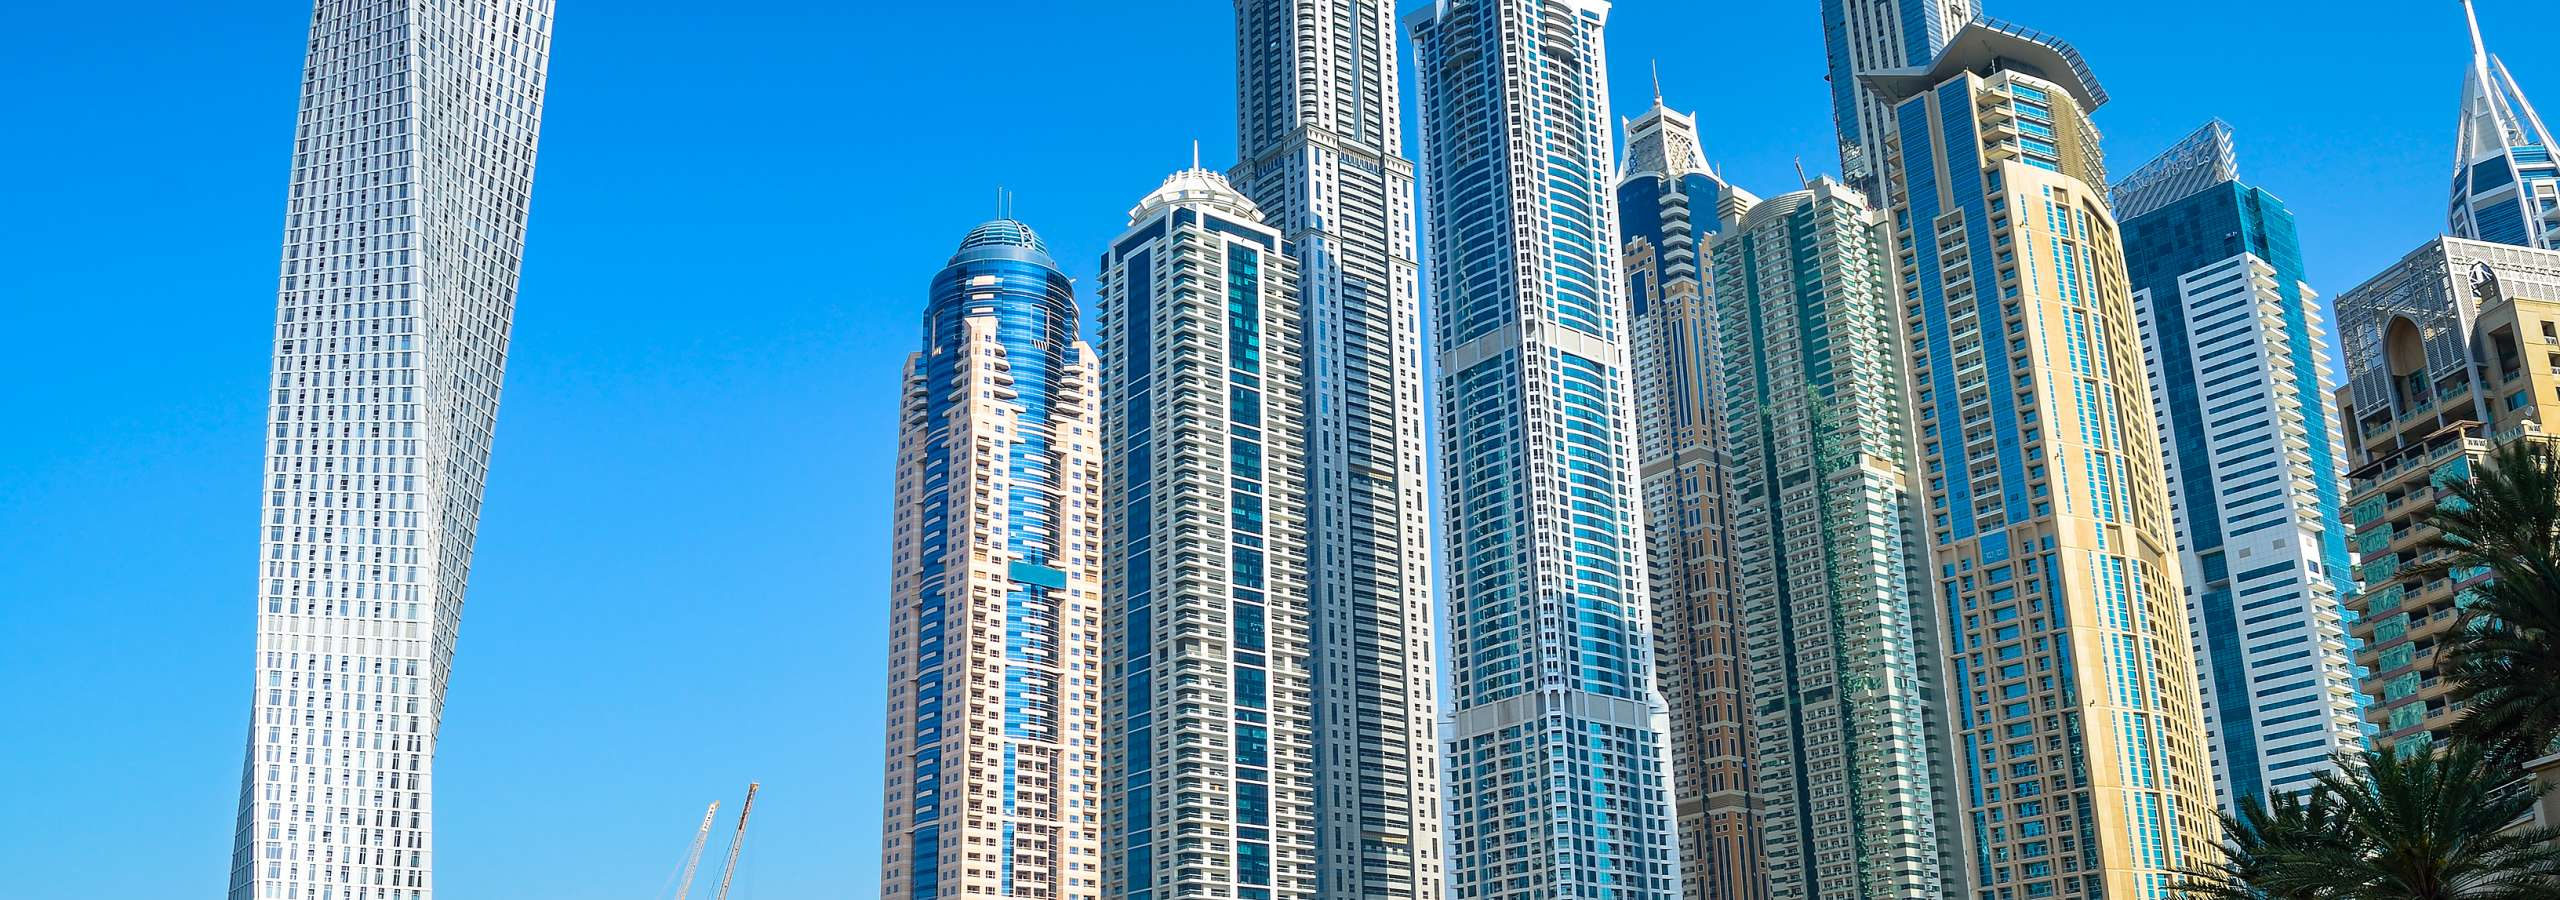 Cayan Tower, Dubai - Teknowaren referenssikohde